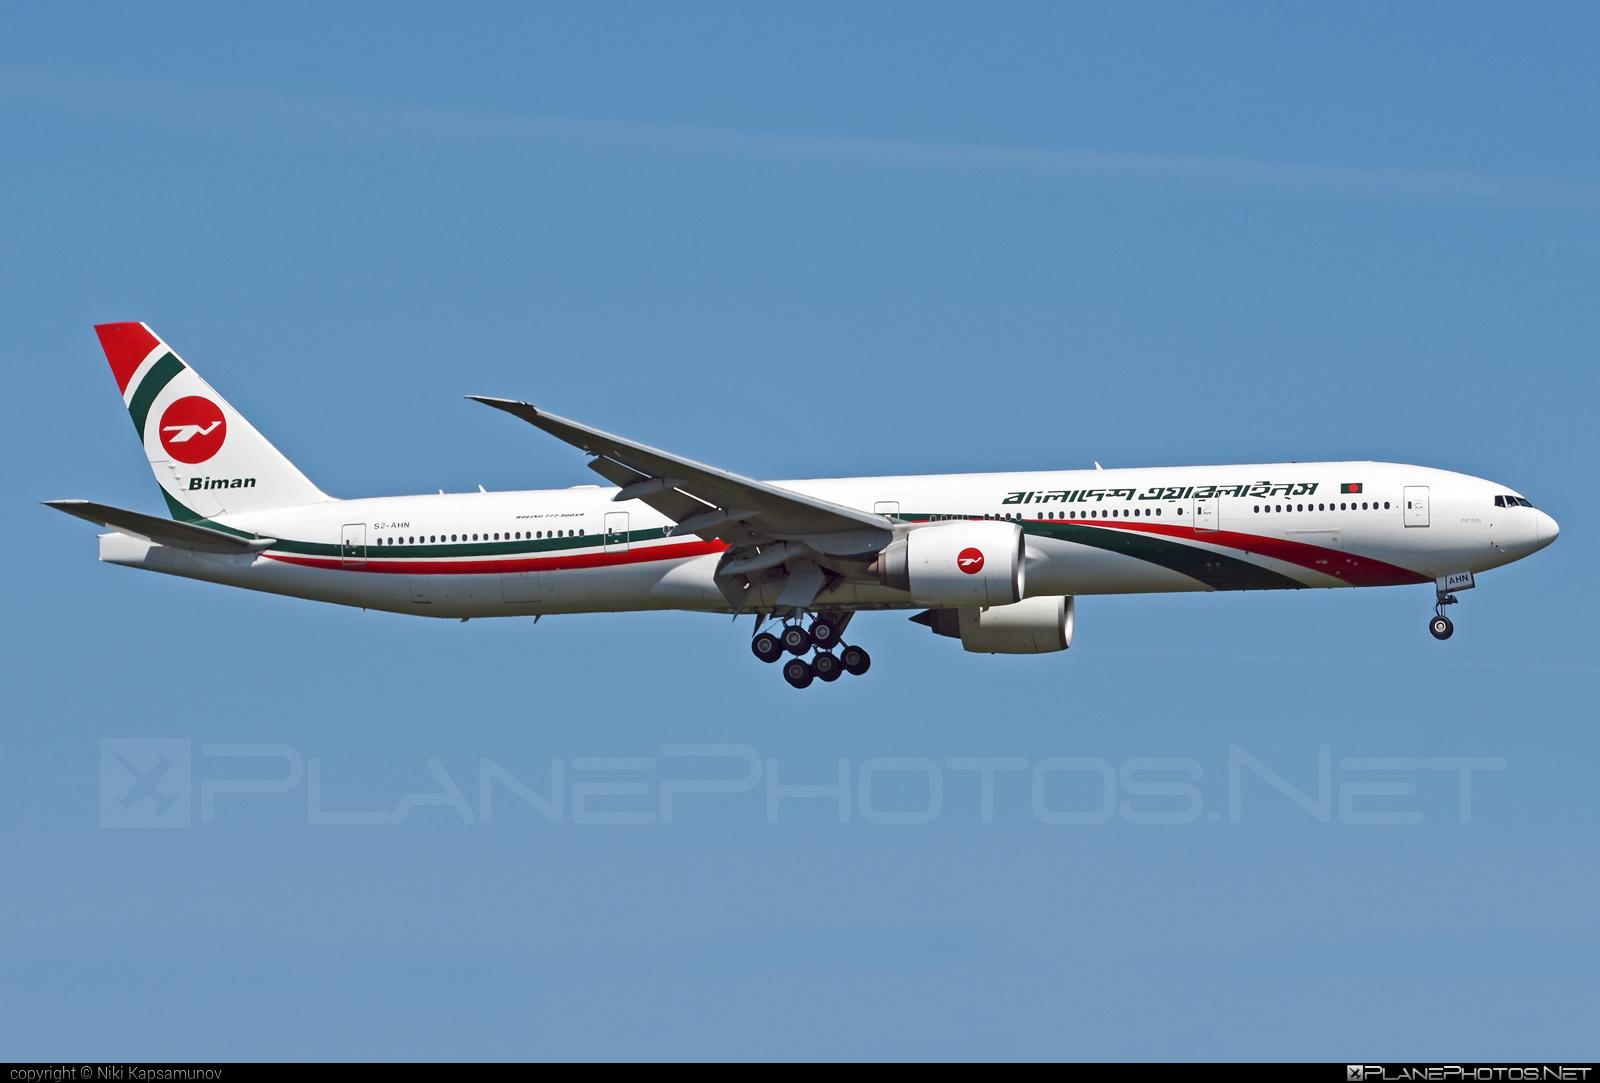 Boeing 777-300ER - S2-AHN operated by Biman Bangladesh Airlines #b777 #b777er #boeing #boeing777 #tripleseven